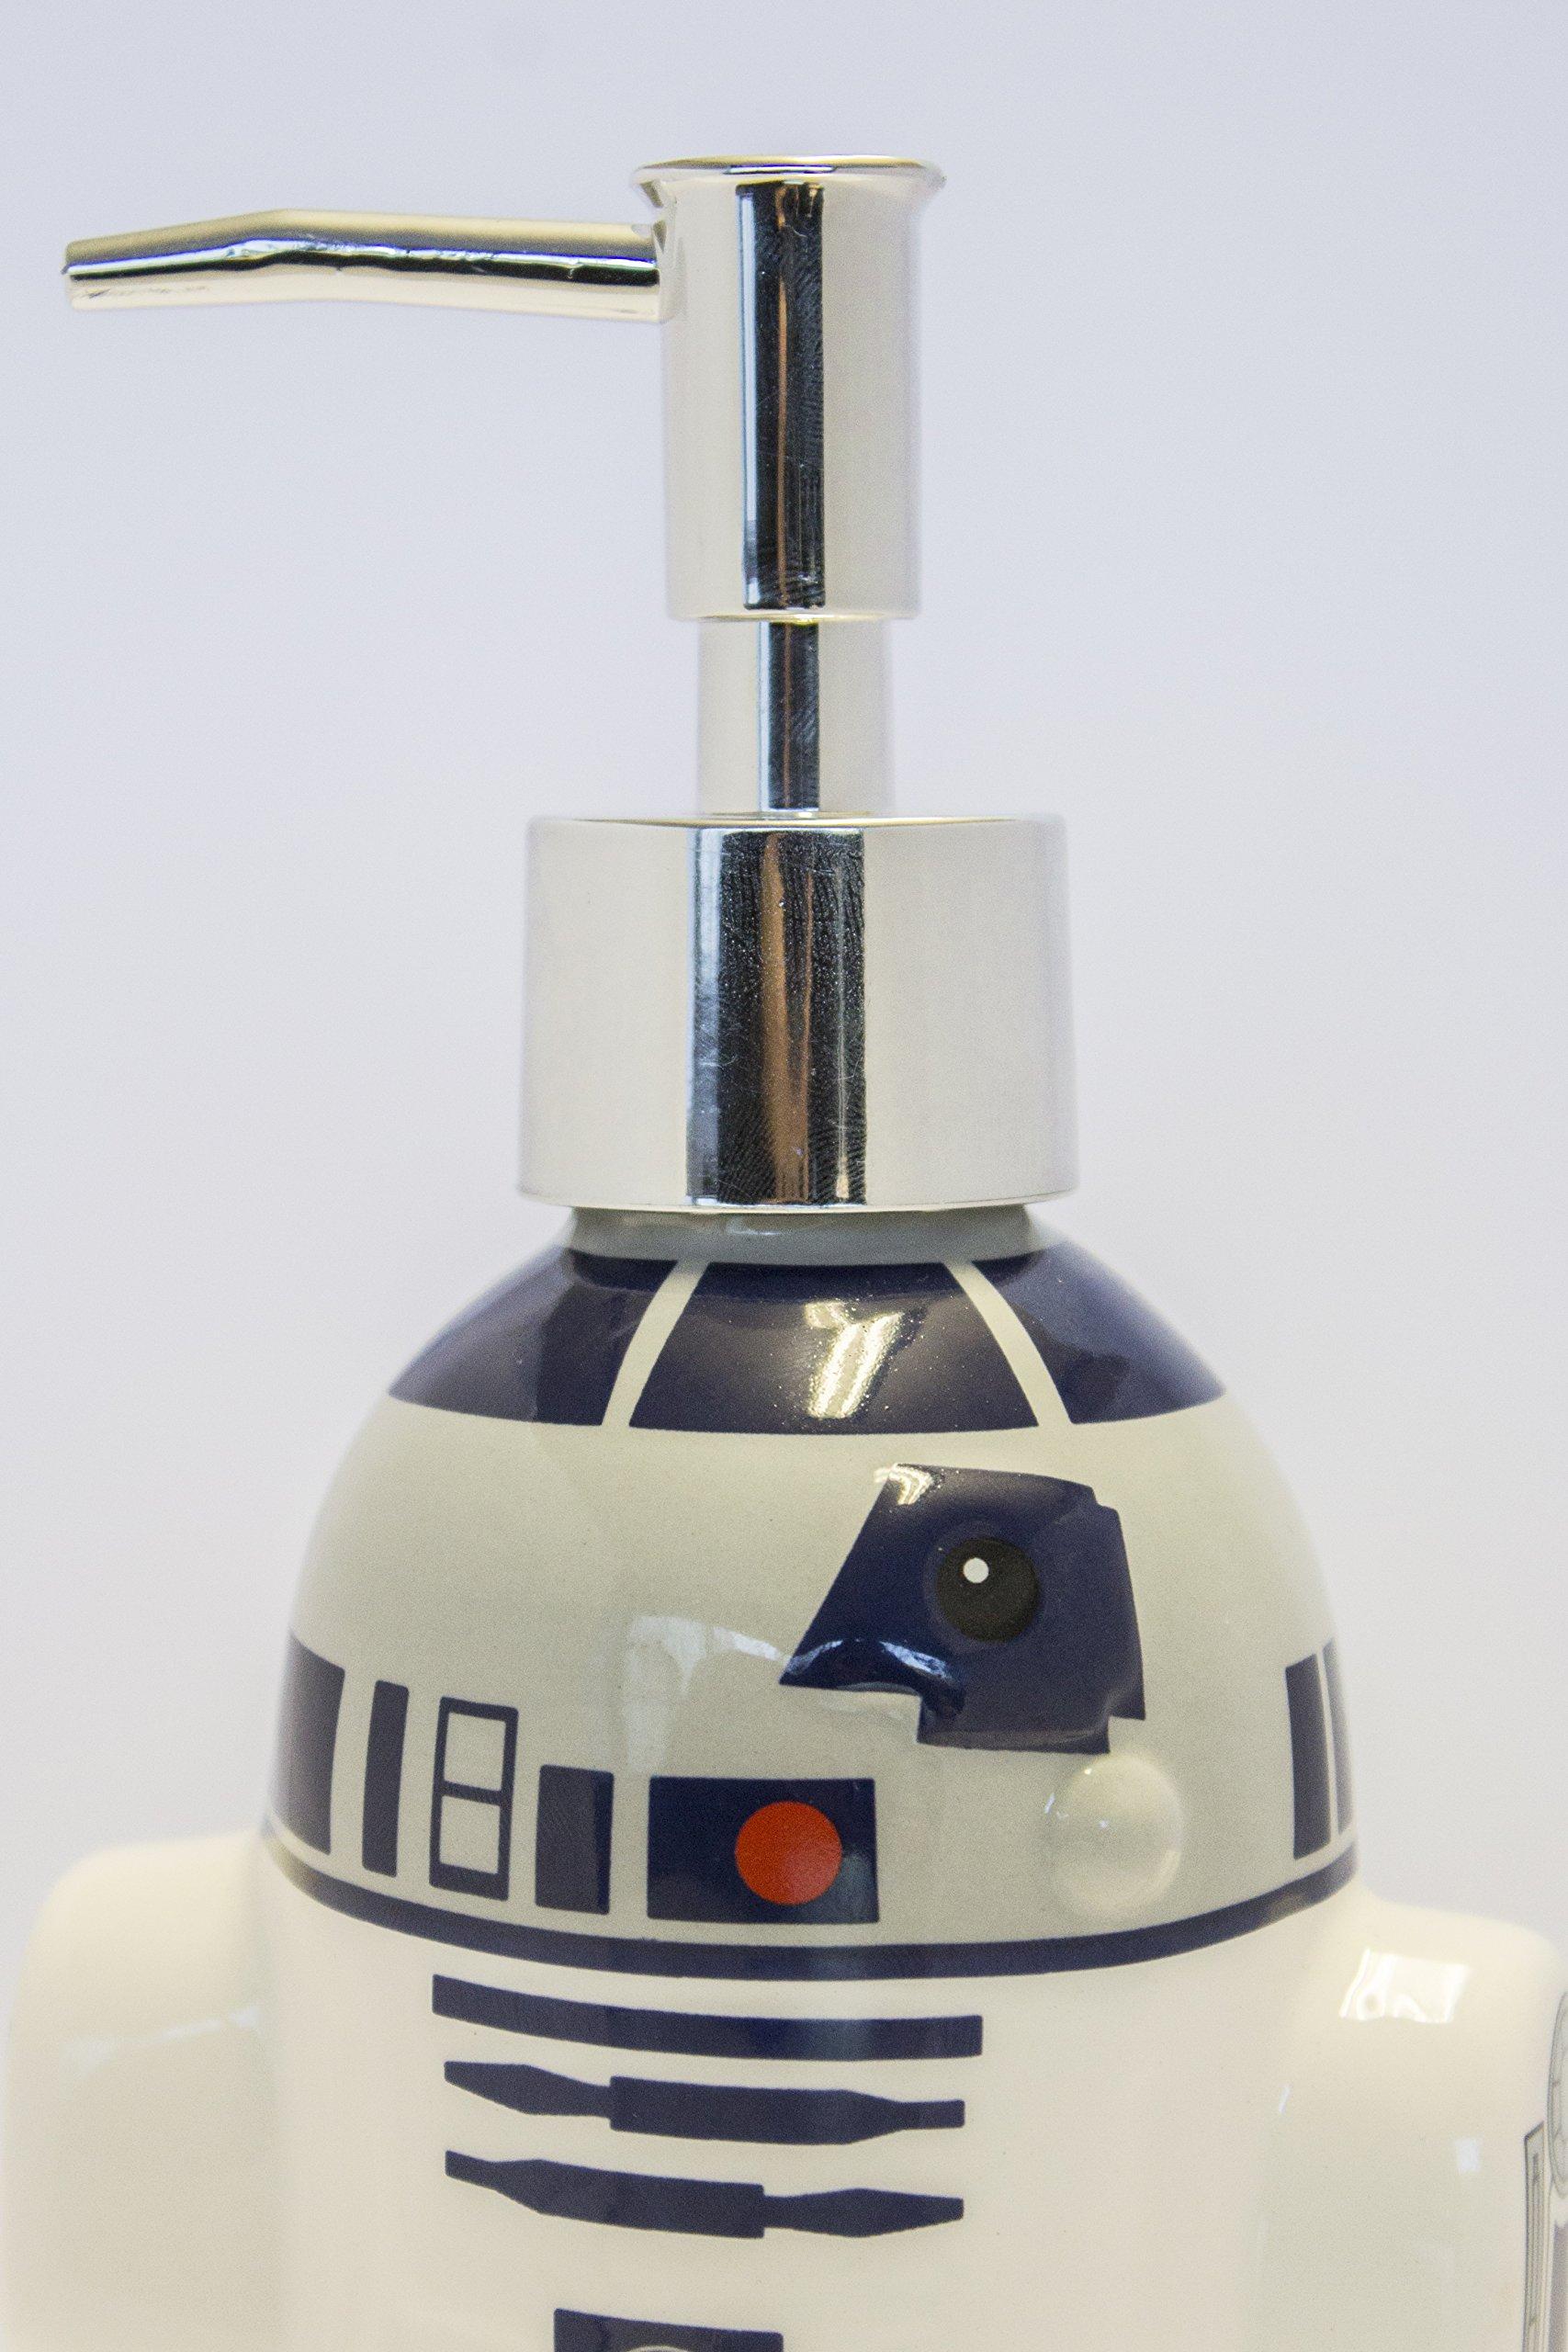 Joy Toy R2D2Jabonera, cerámica, Multicolor, 10x 6x 21cm